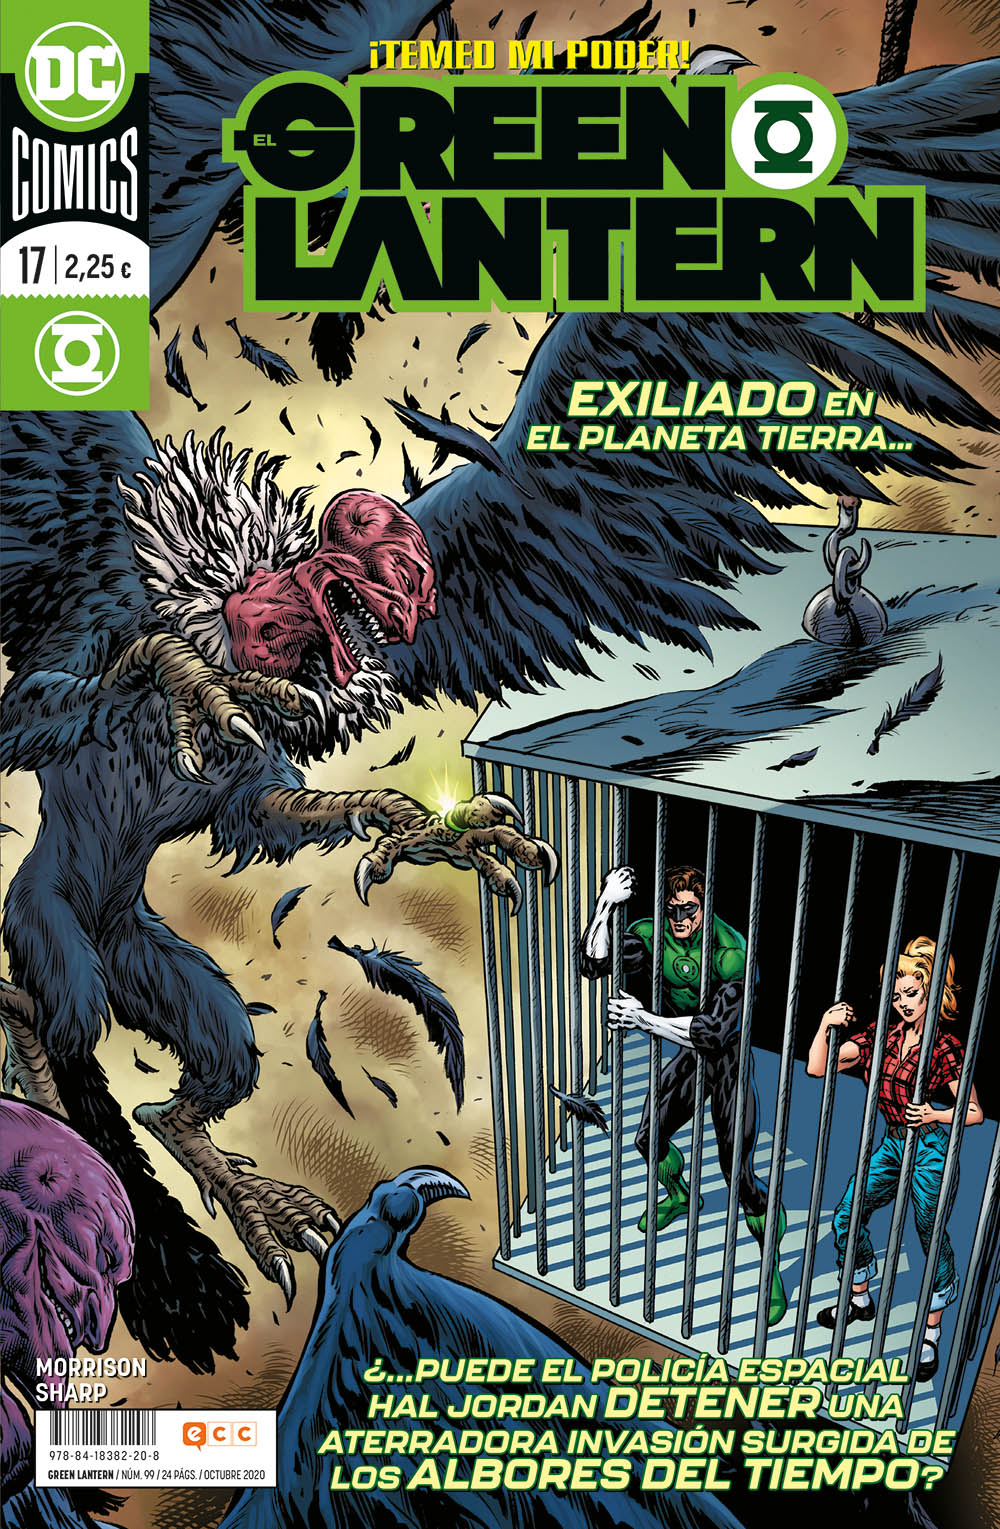 Green Lantern #99 / 17